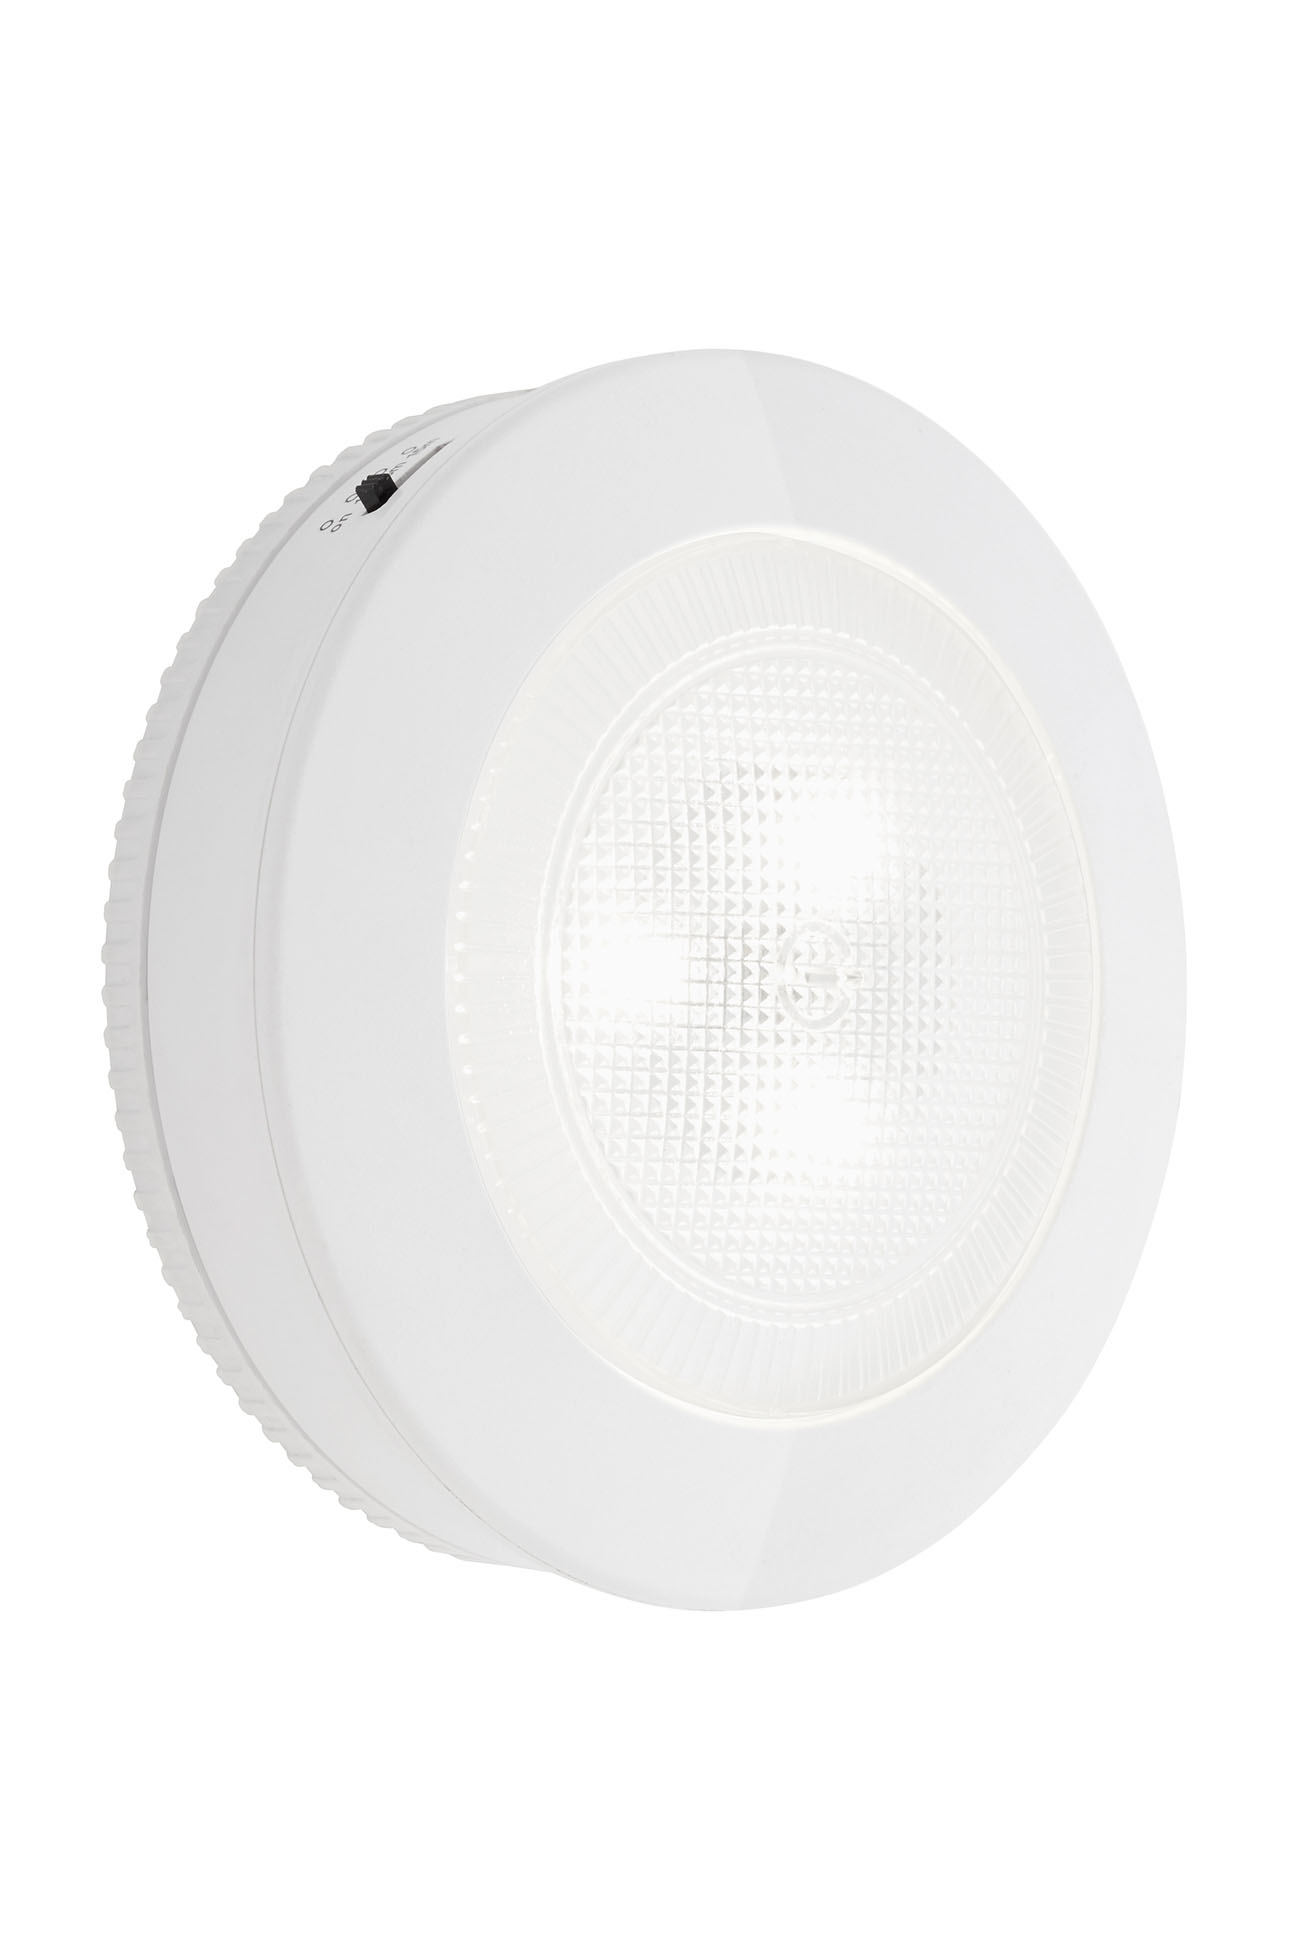 LED Push-Light, Ø 9,1 cm, 0,4 W, Weiß